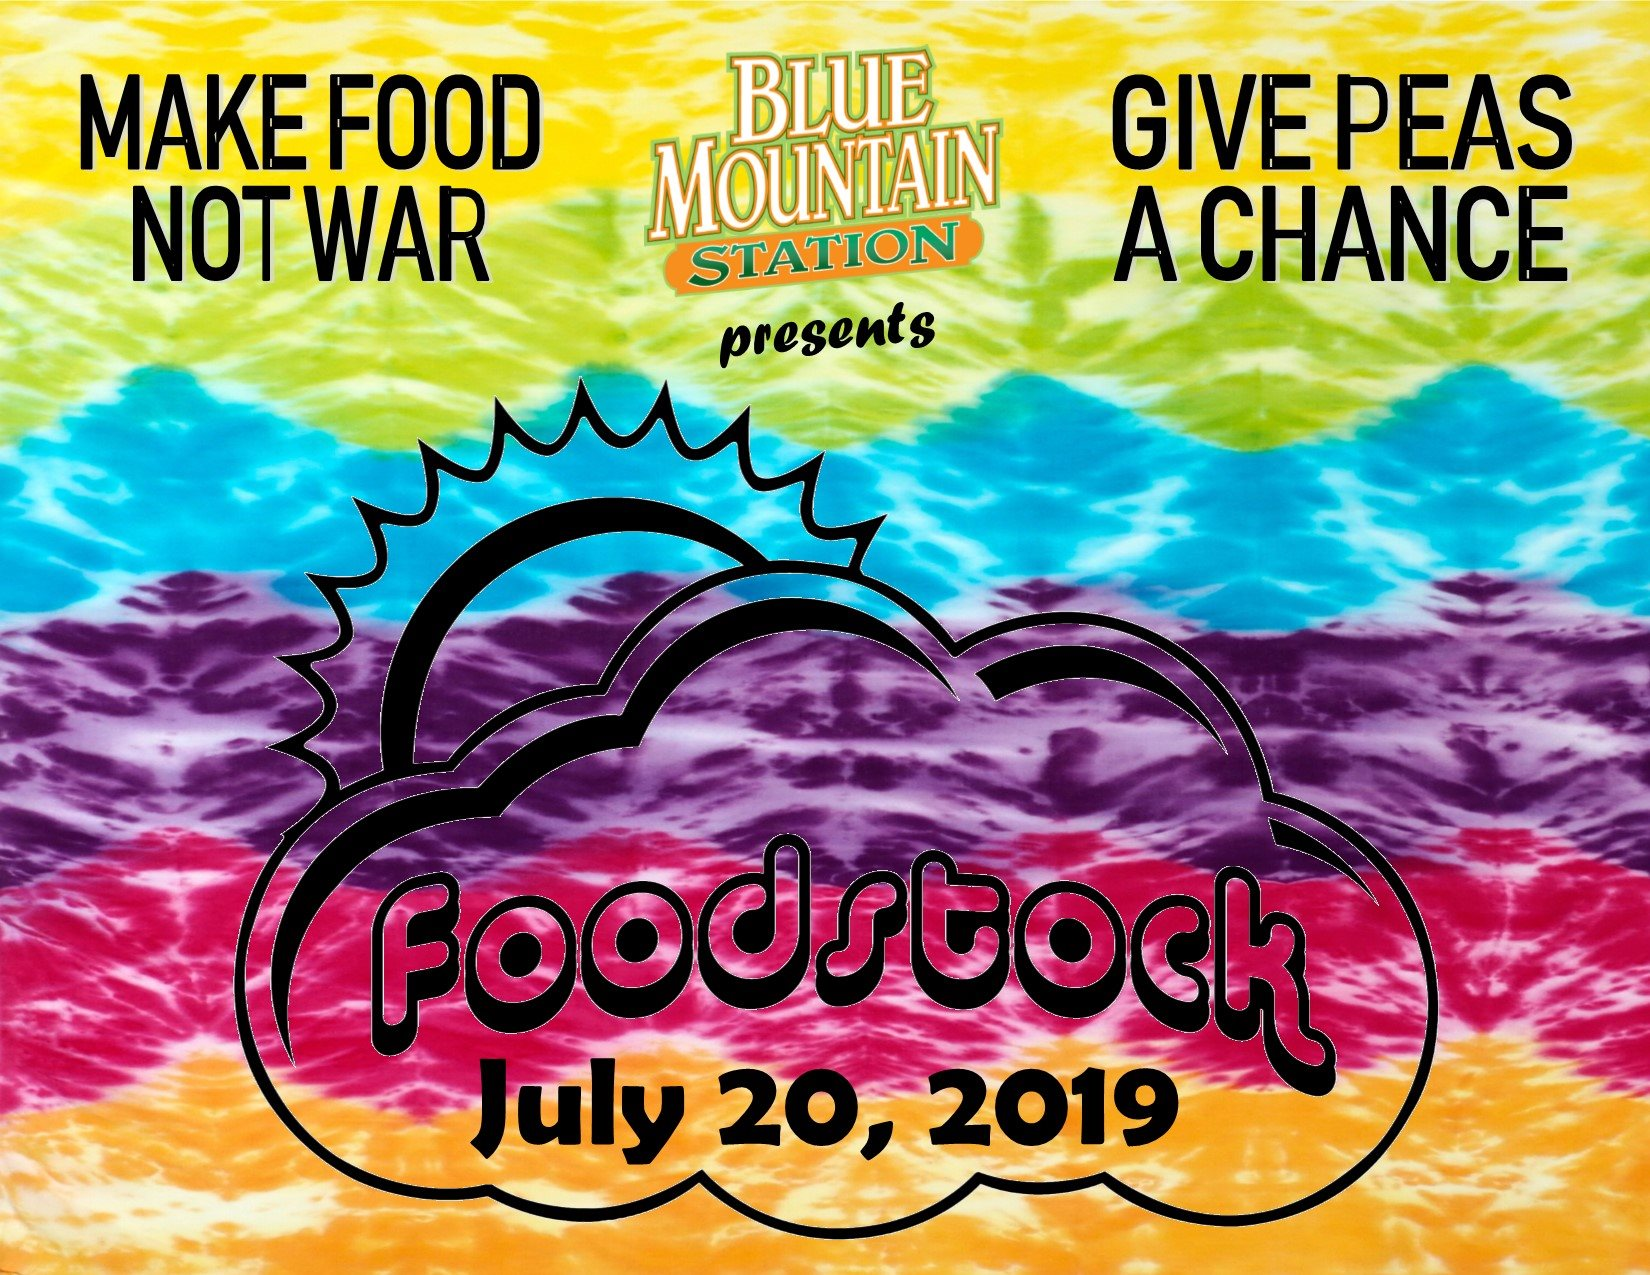 Blue Mountain Station Foodstock 2019.jpg